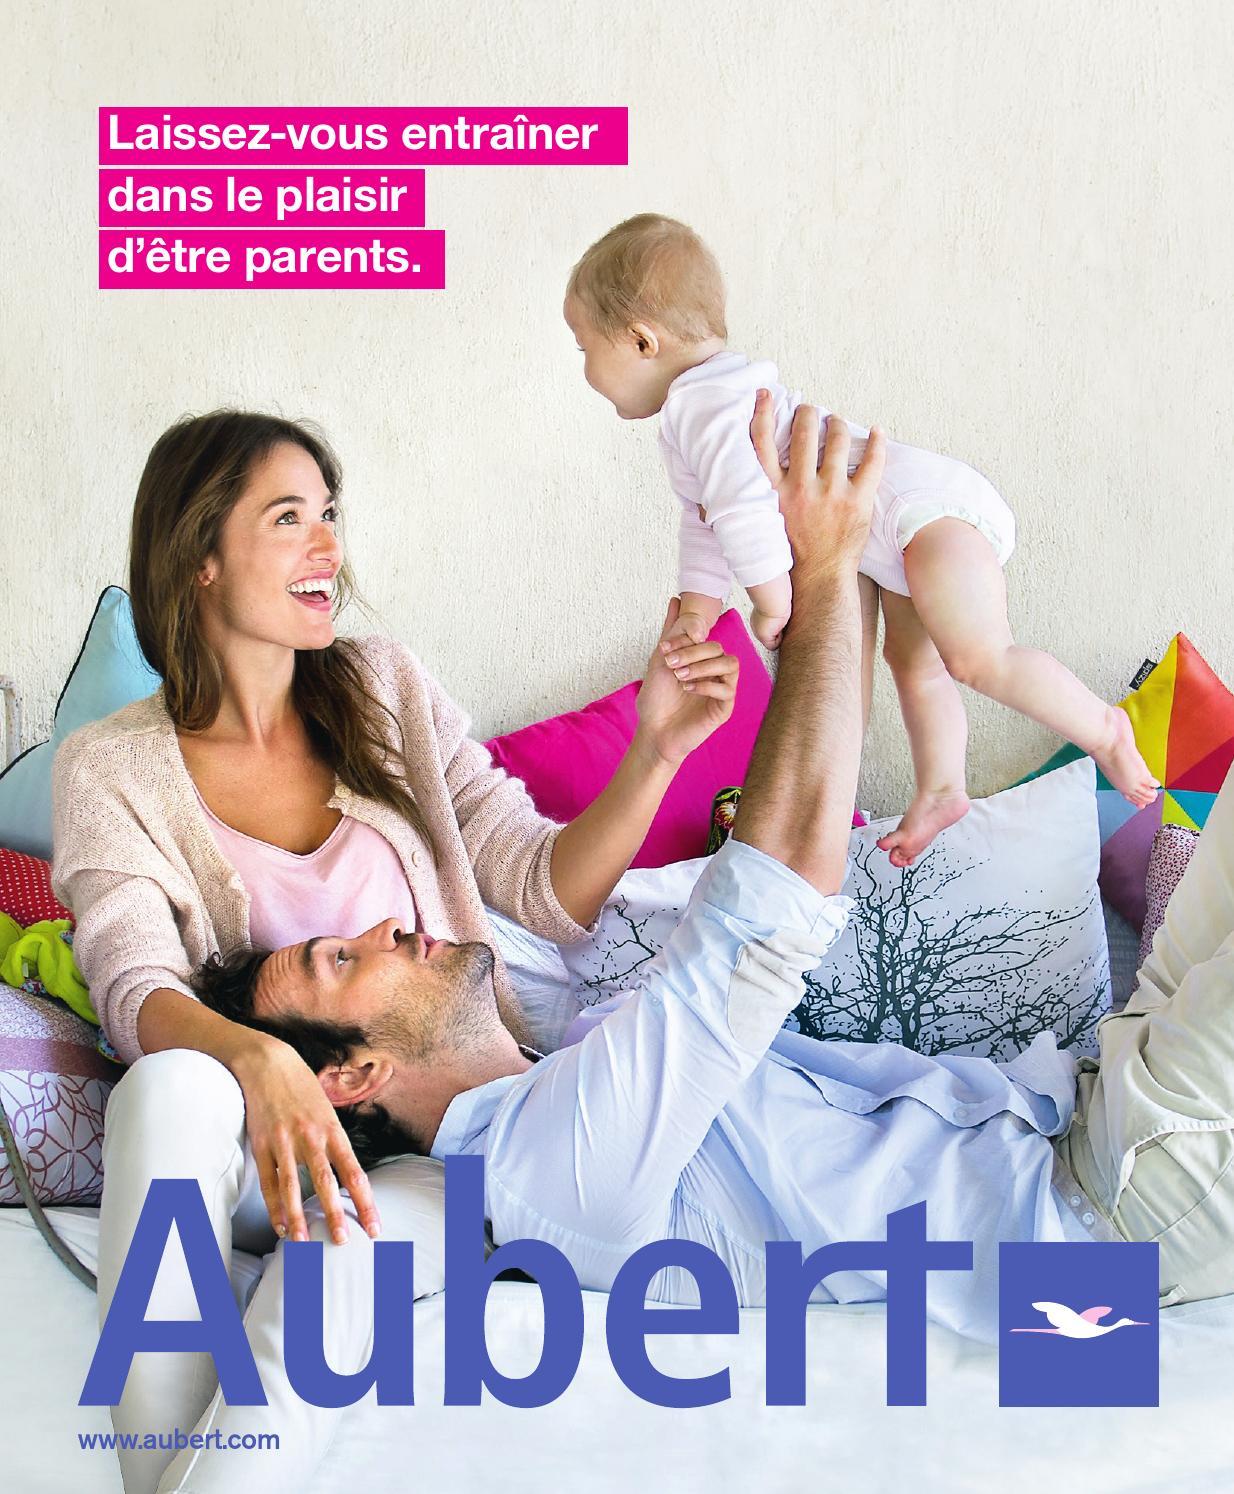 by 2013 issuu Aubert marin Guide 256pages 190x230 céline PXiwOkZuT